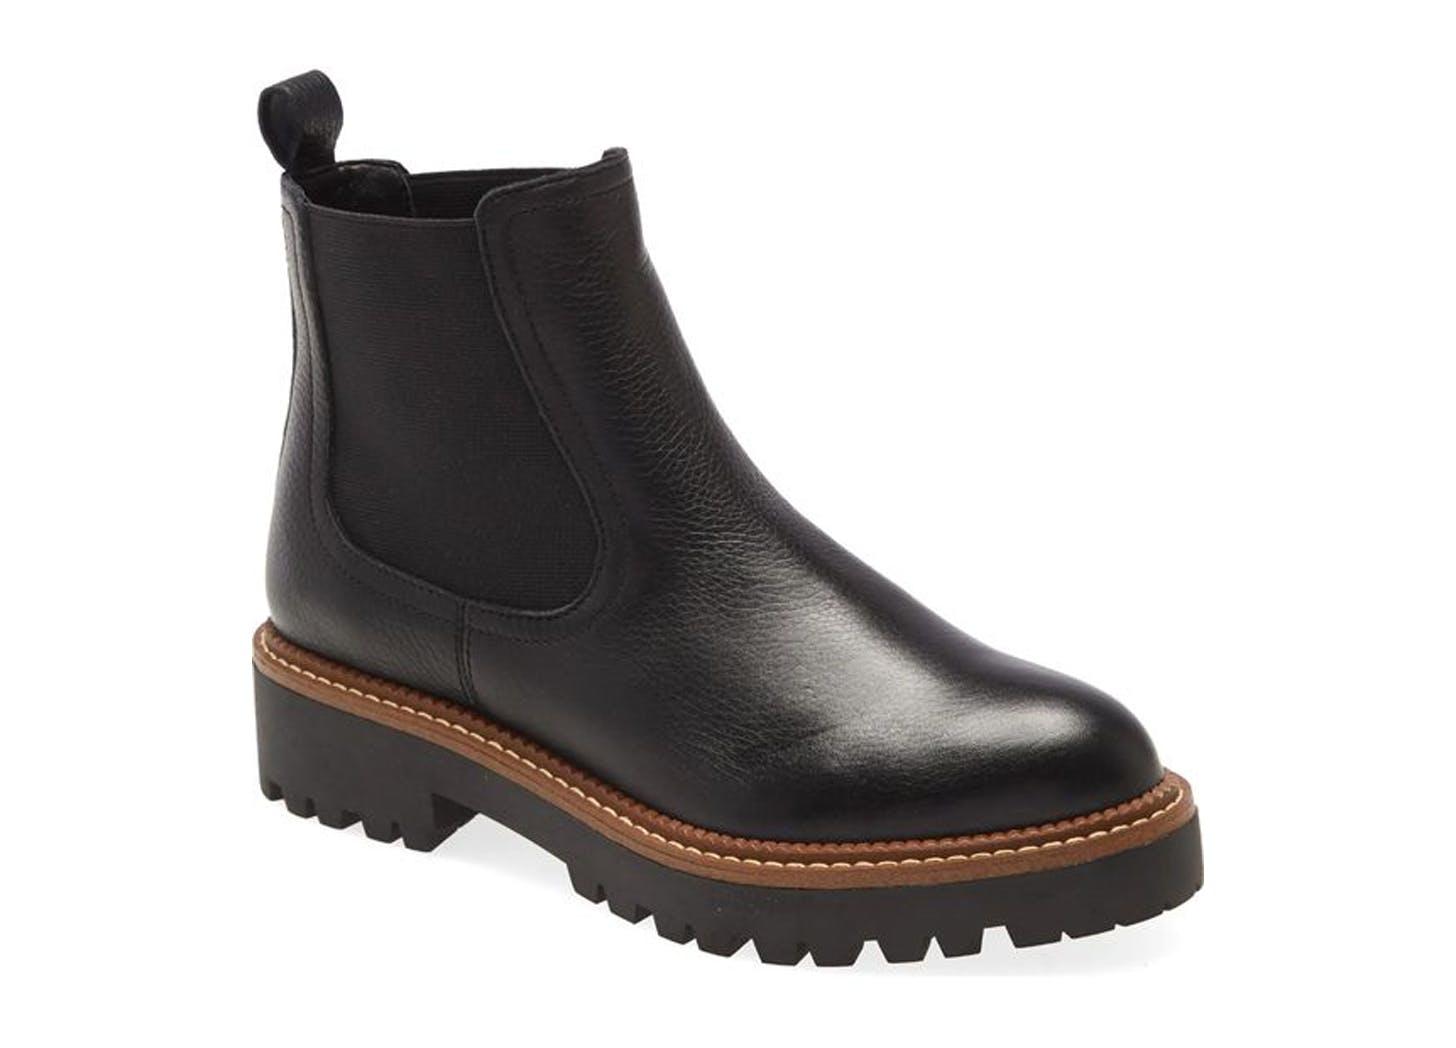 caslon nordstrom anniversary sale boots